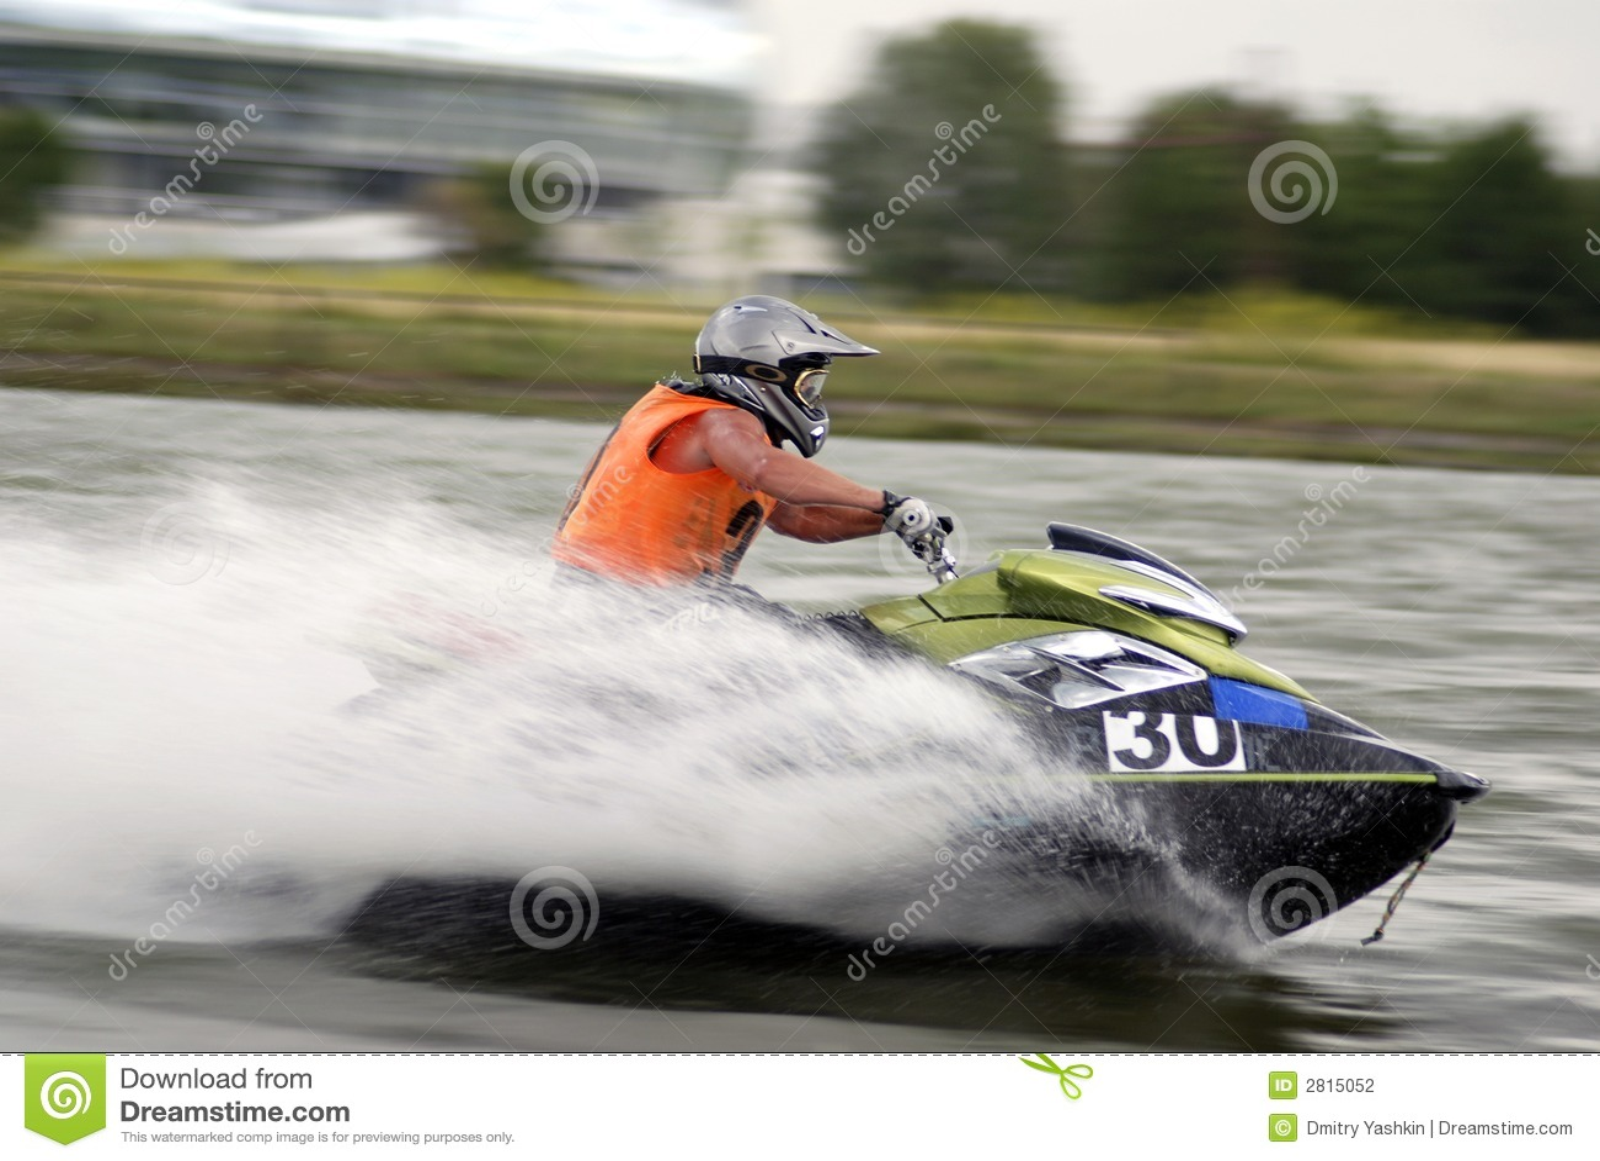 High-speed water jetski